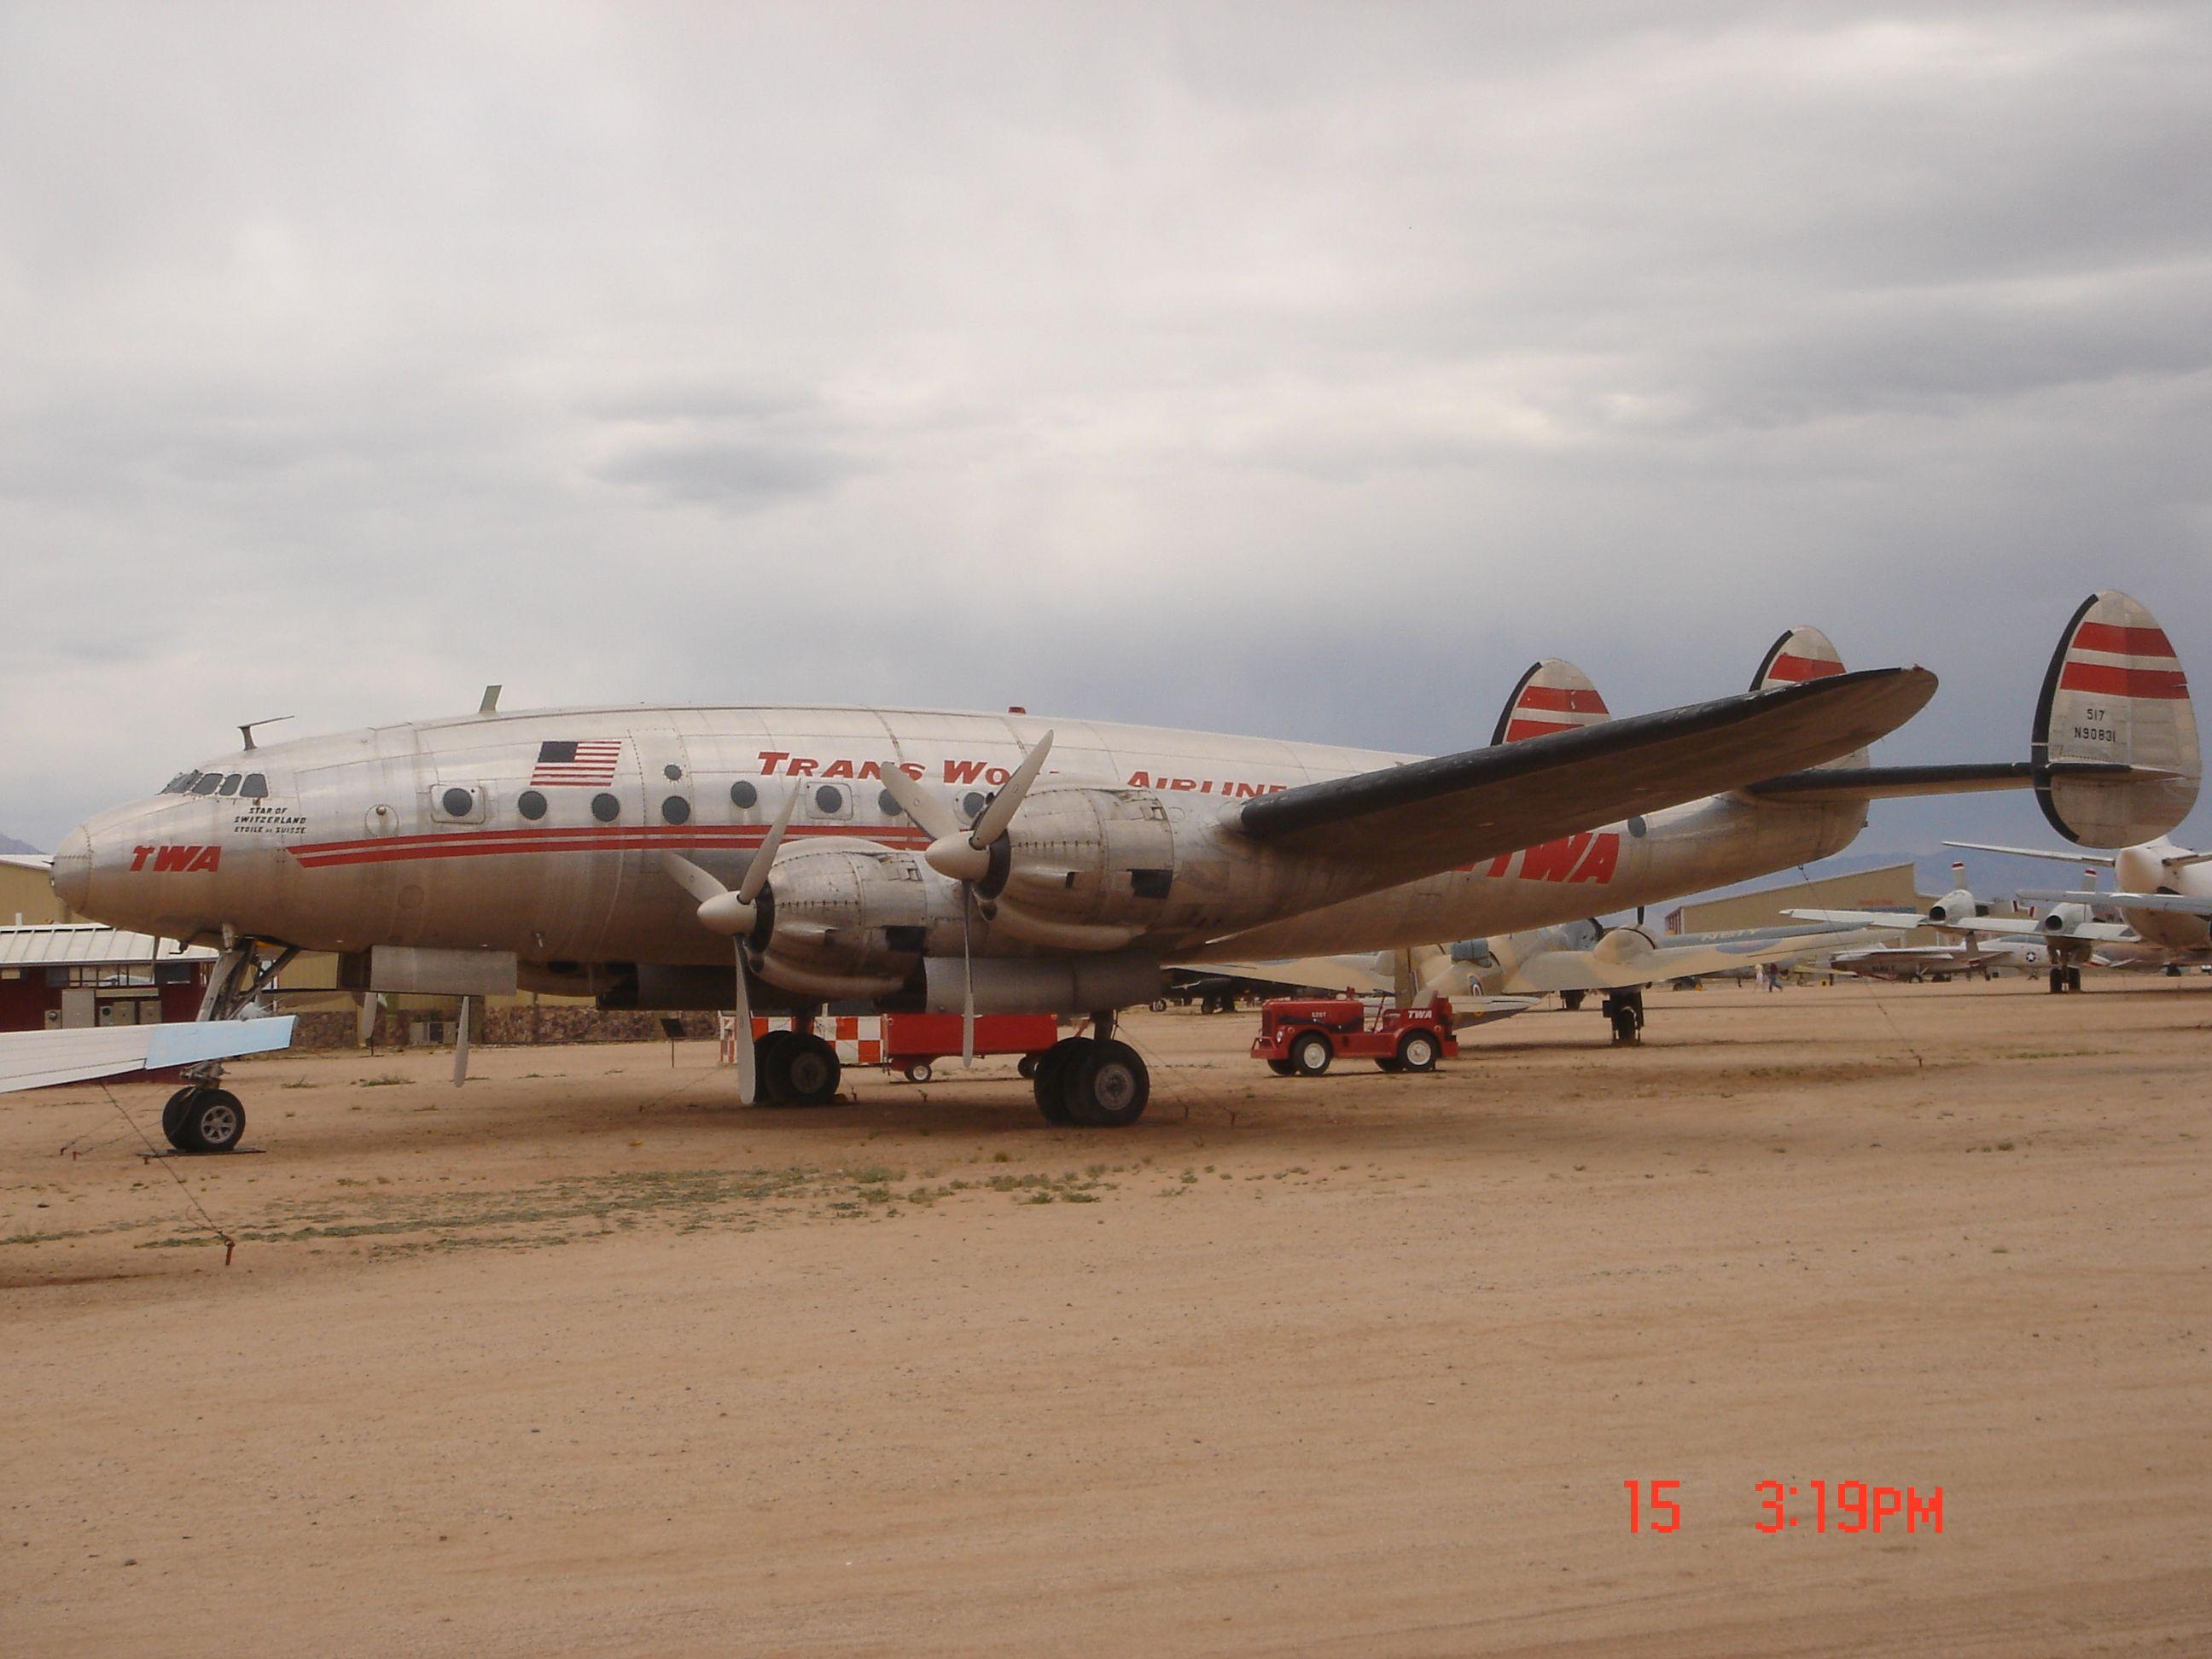 Lockheed Constellation Tucson Aircraft Museum Aircraft